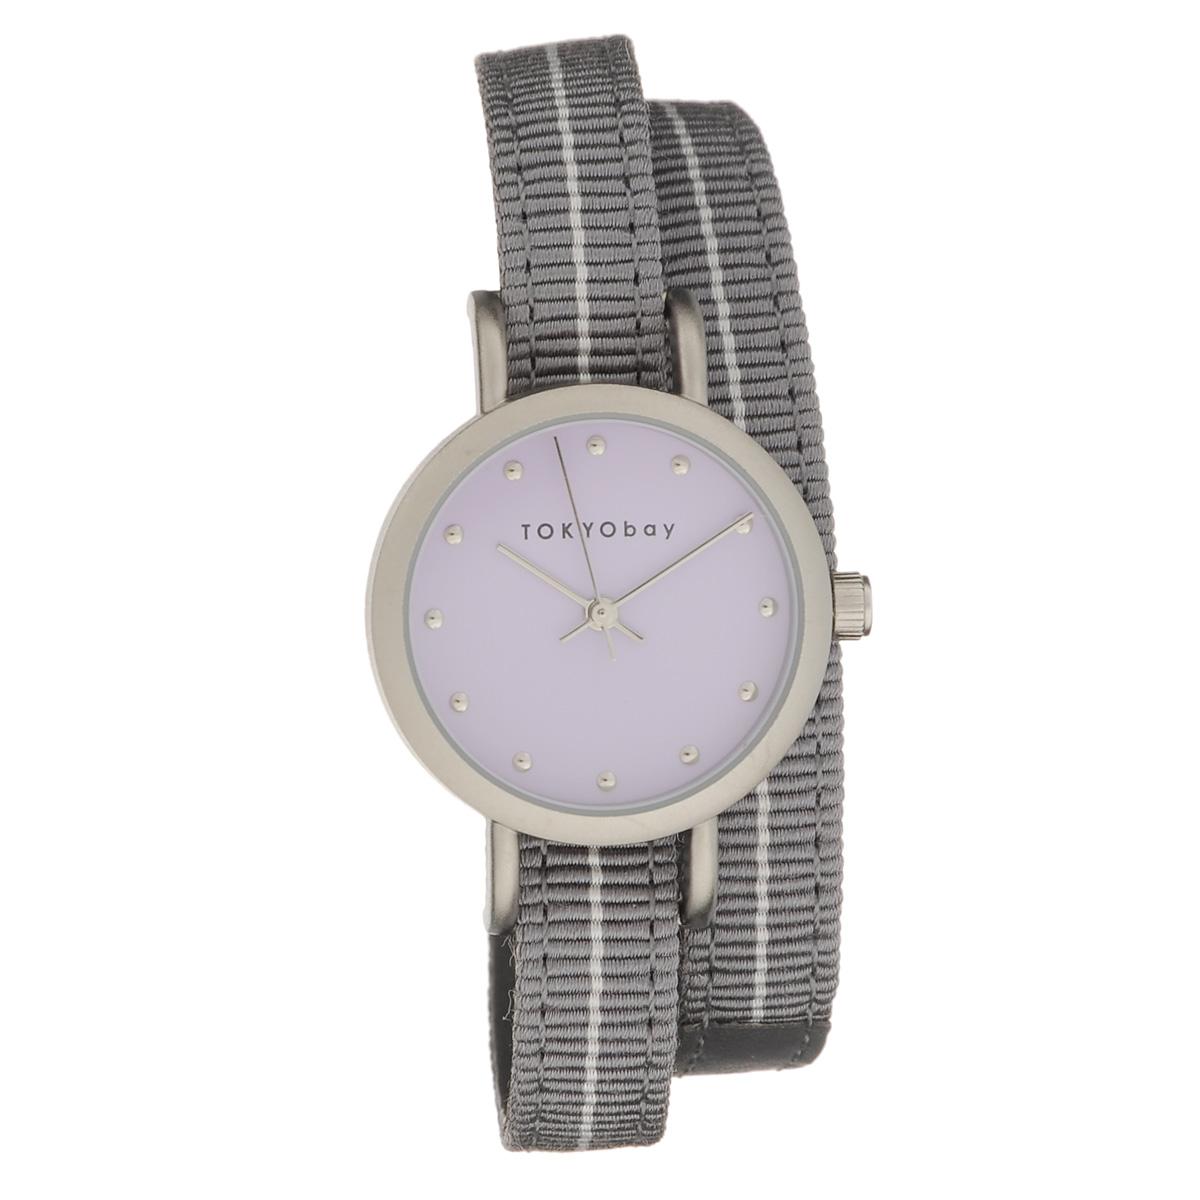 Часы женские наручные Tokyobay Obi, цвет: серый. T233-GY tokyobay часы tokyobay t233 gr коллекция obi